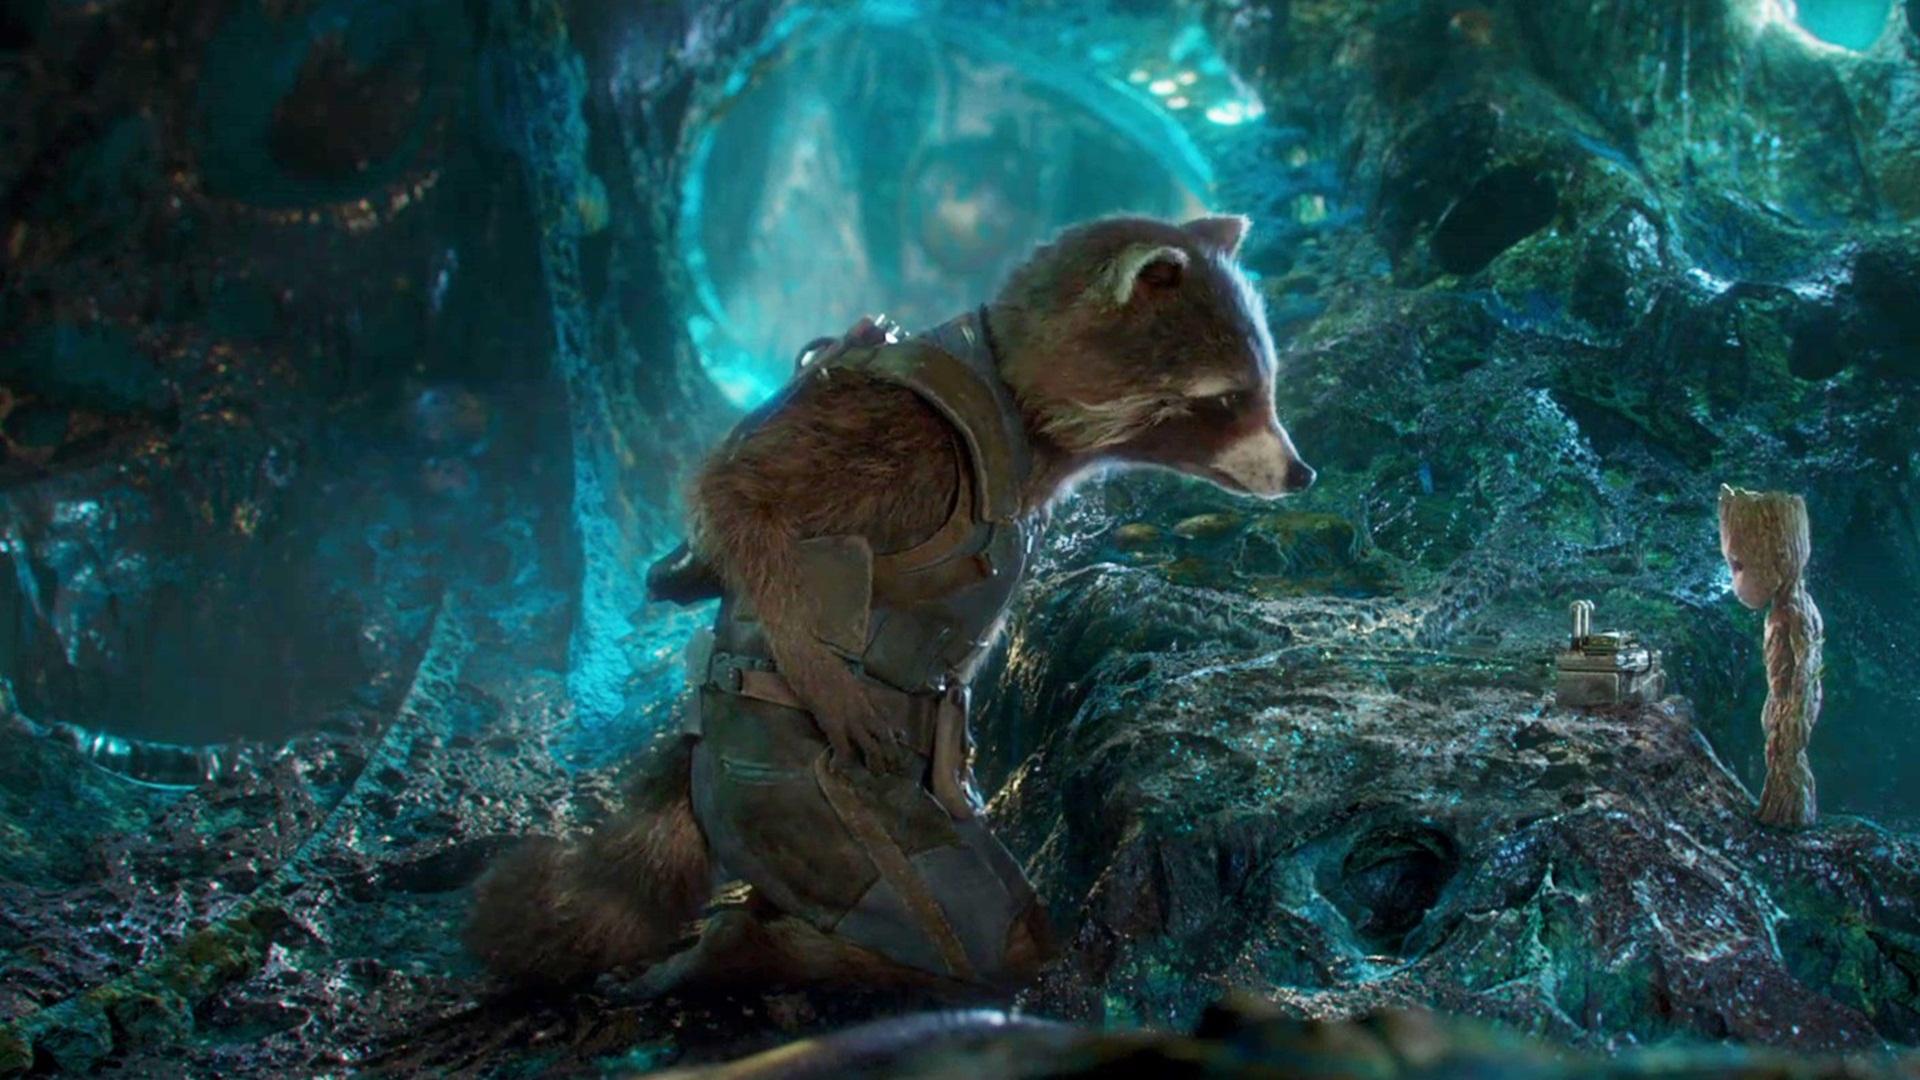 Guardians Of The Galaxy Vol 2 Rocket Raccoon 2017 1920x1080